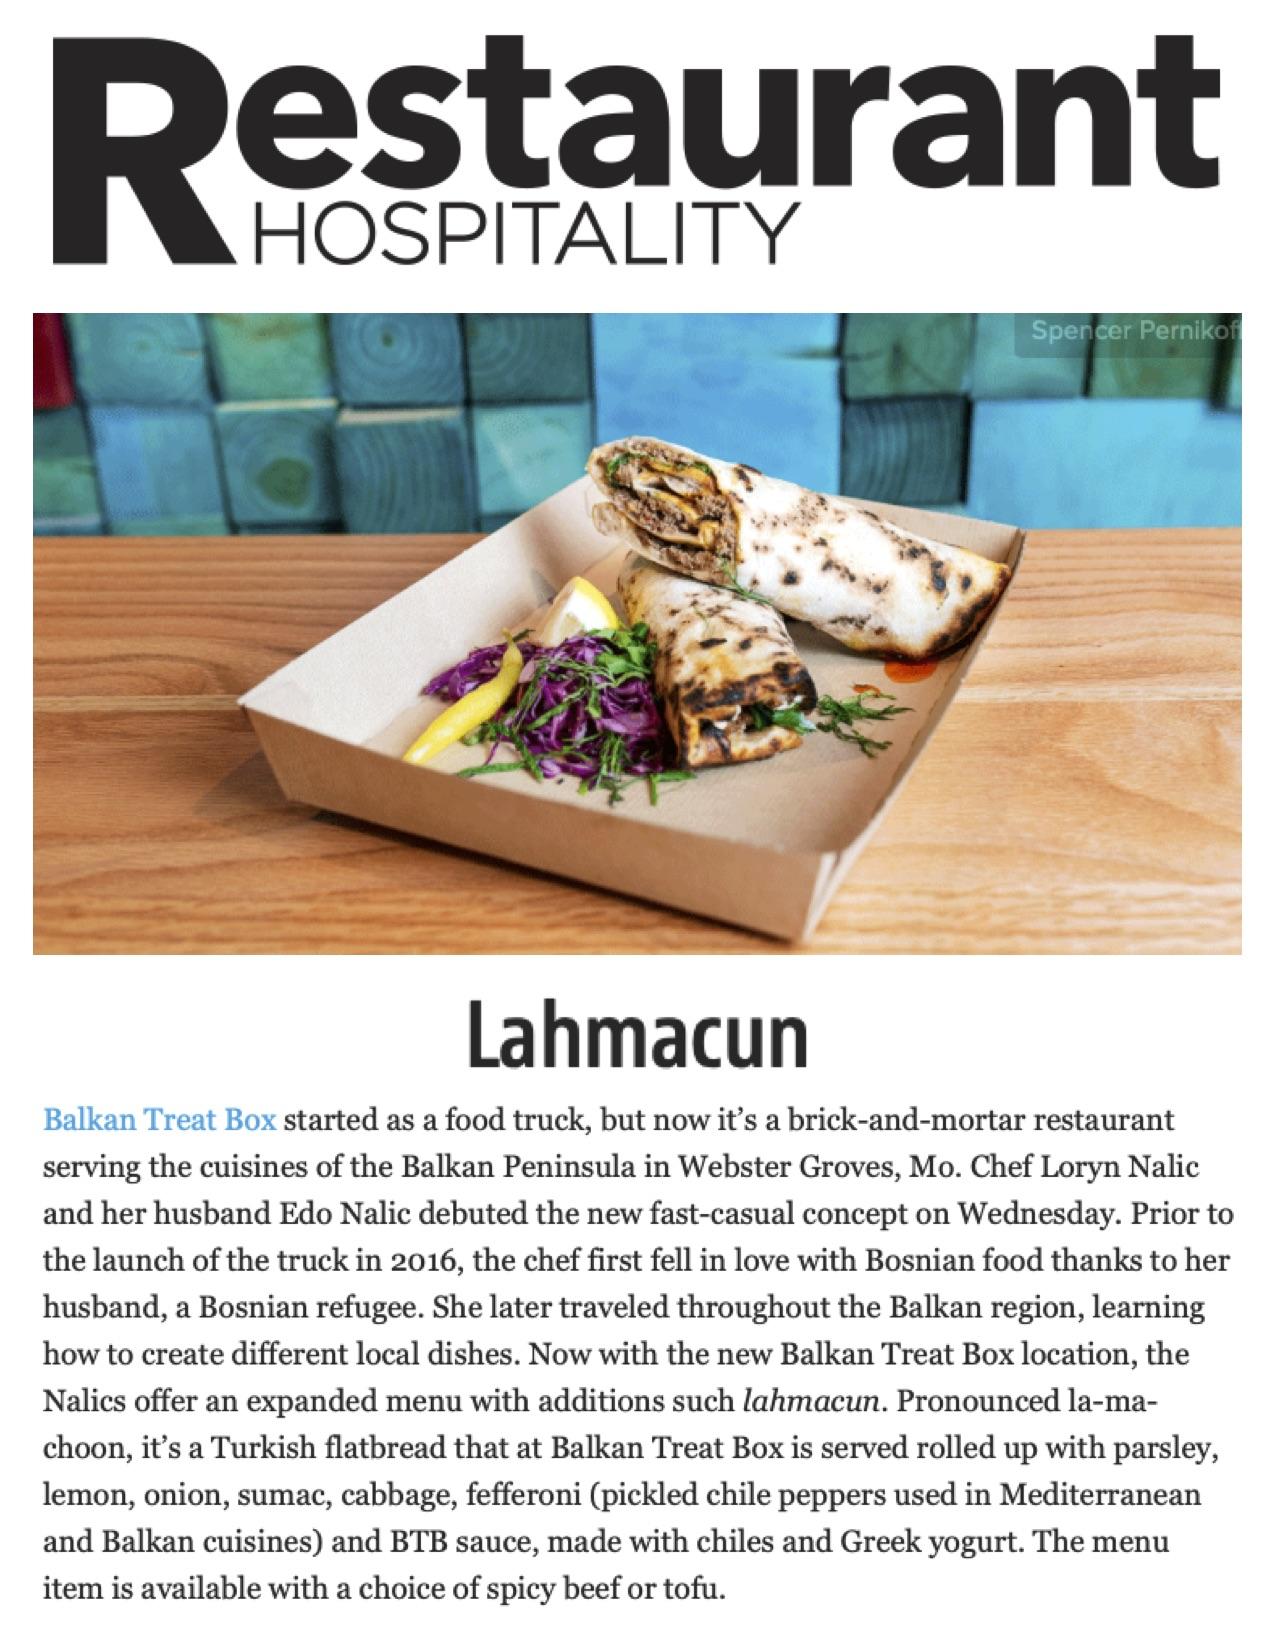 Restaurant Hospitaltiy Feb 2019.jpg